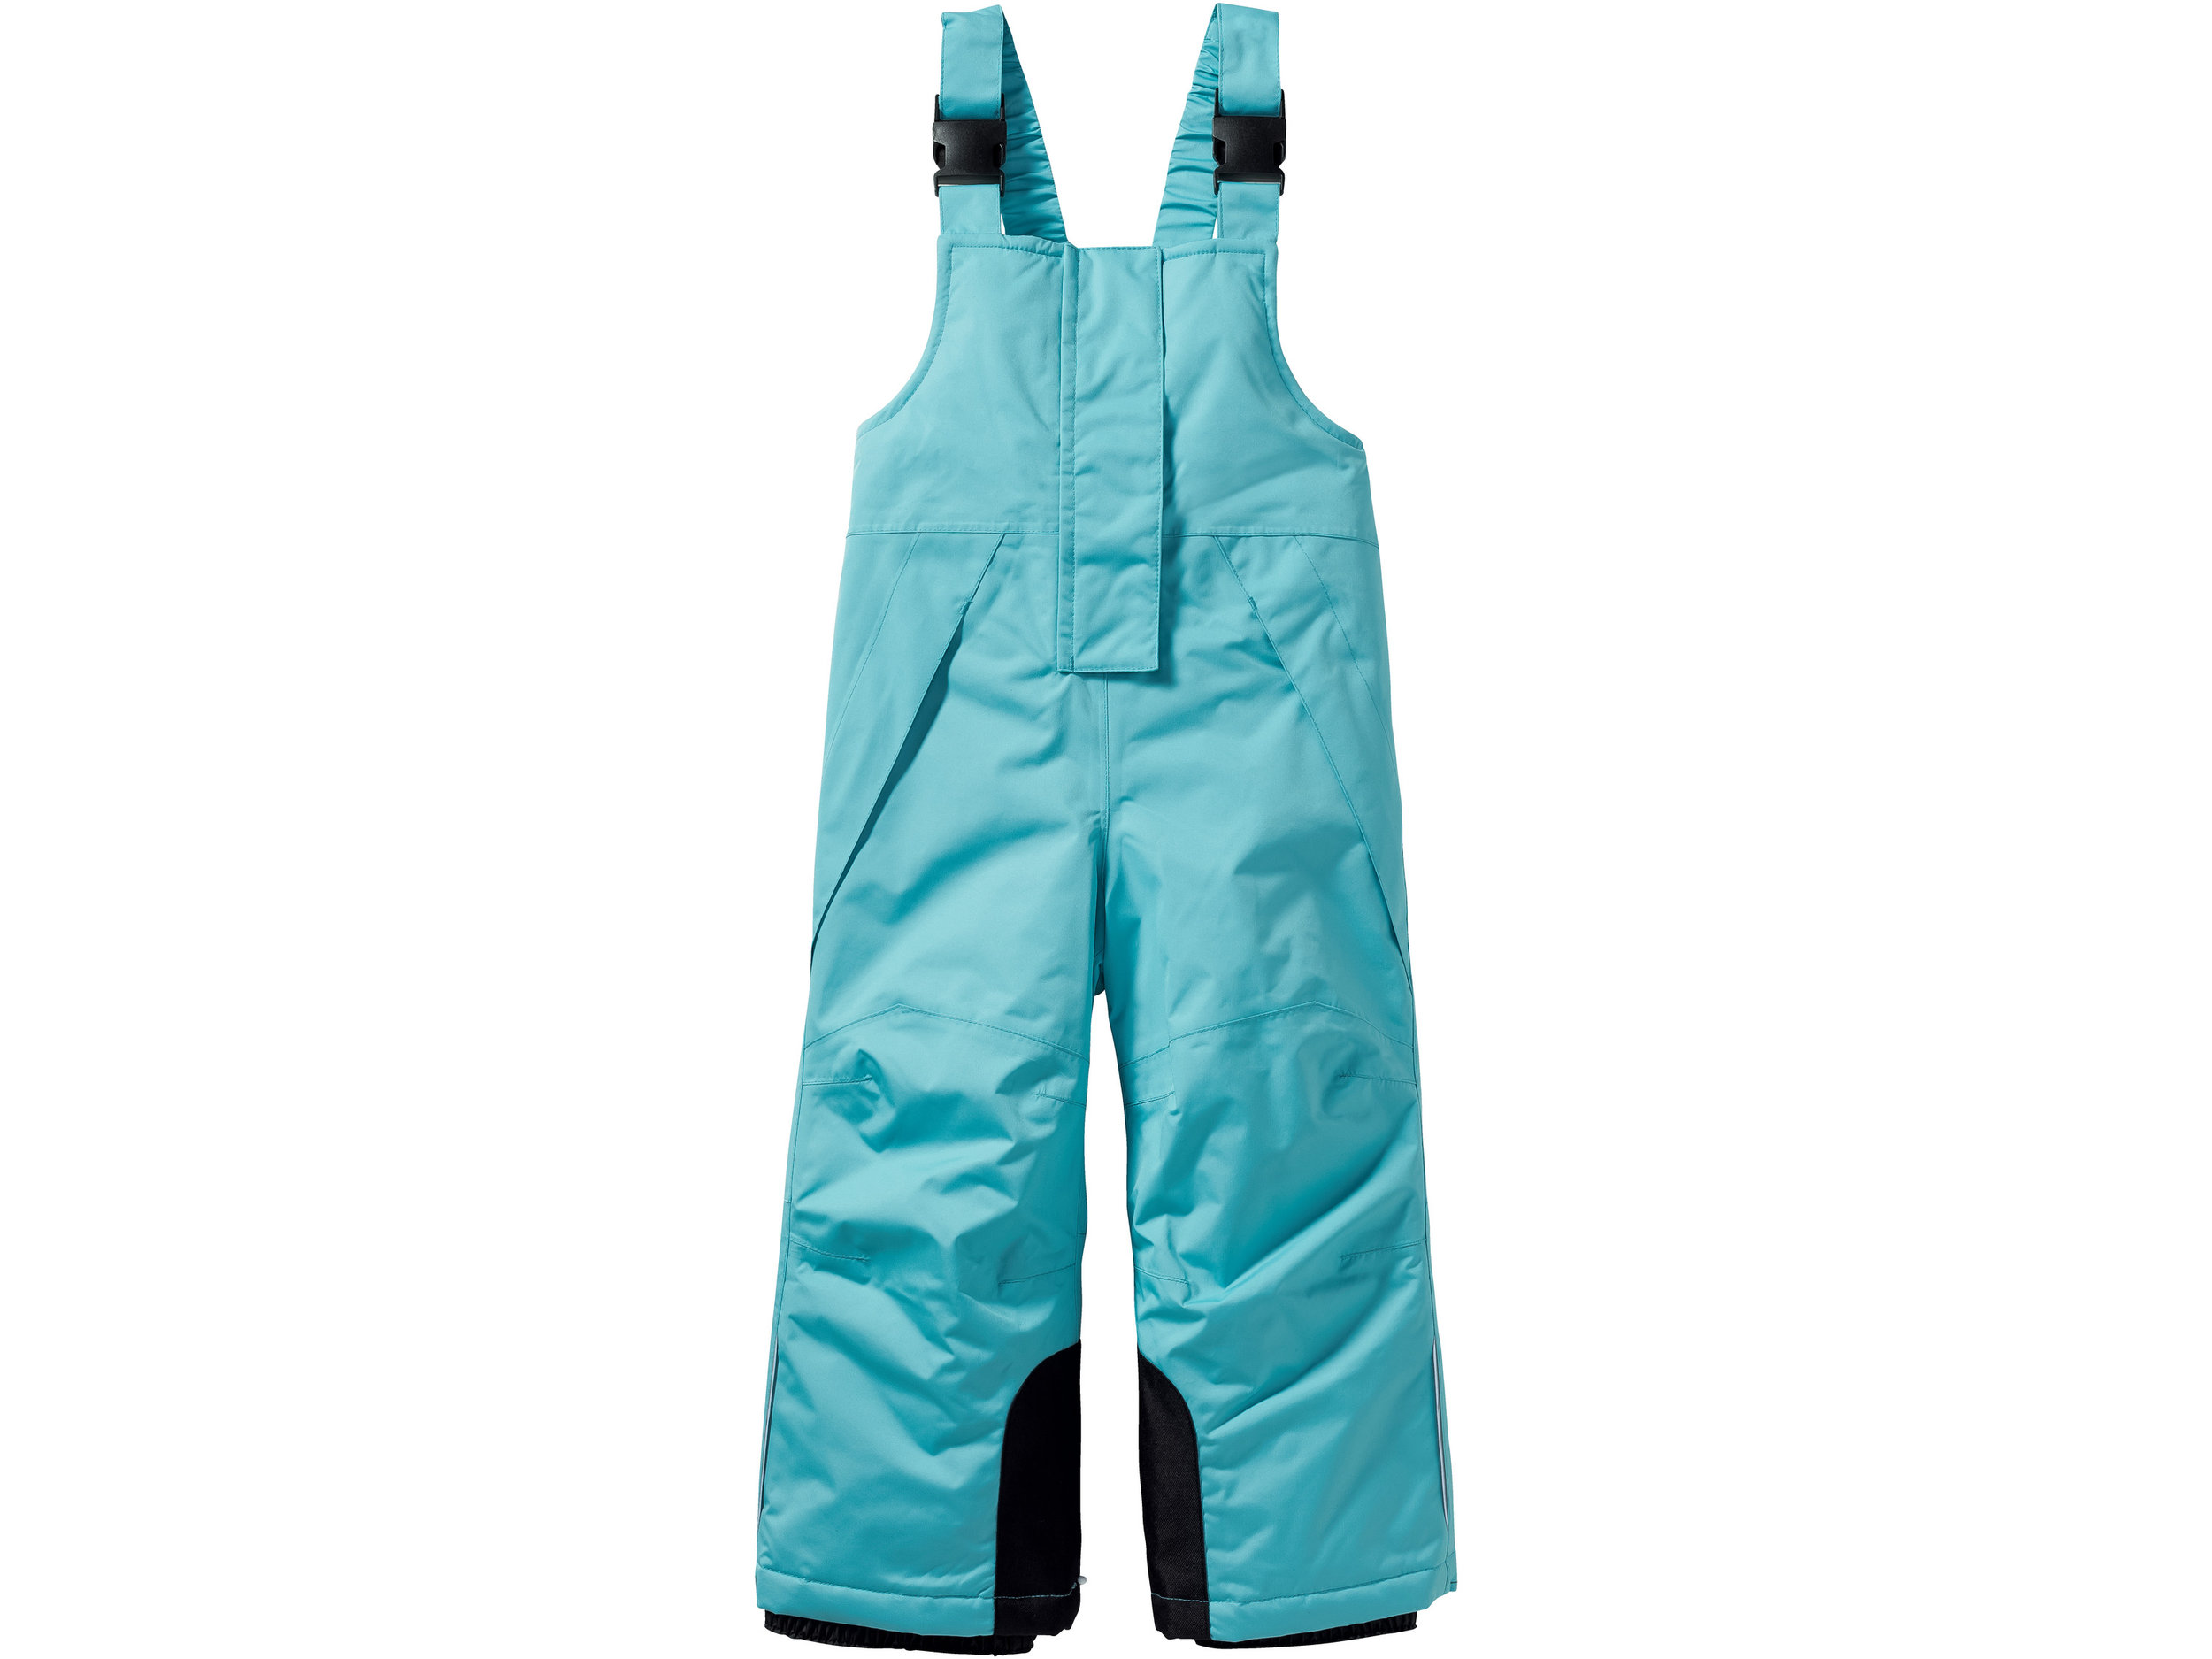 Kids' Ski Trousers £8.99 (2).JPG